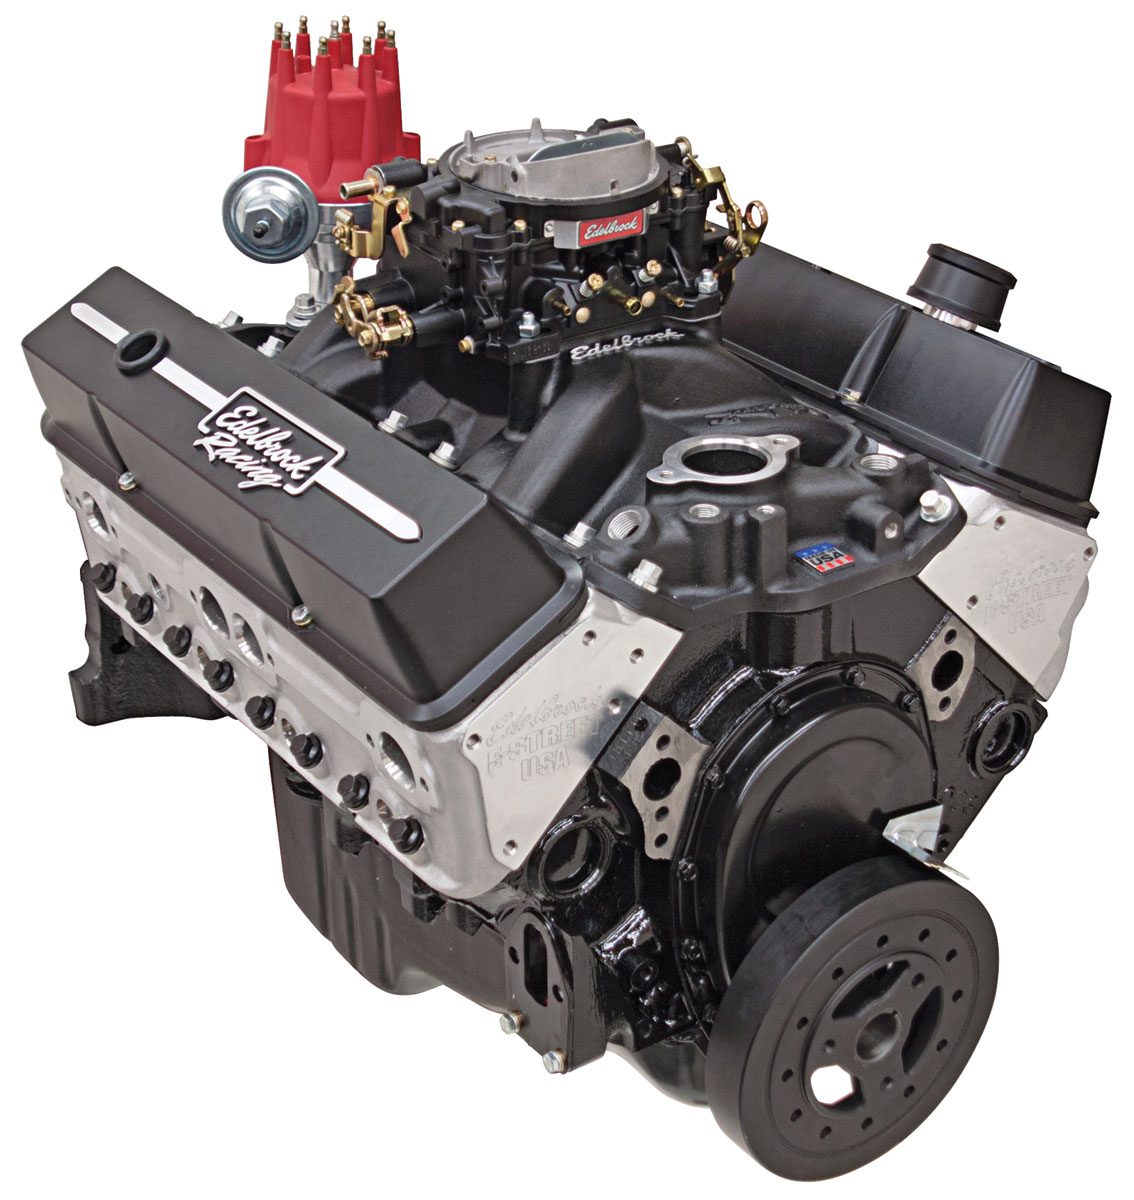 Crate Engine, E-Street 315HP Carbureted, Edelbrock, Chevrolet 350, Black